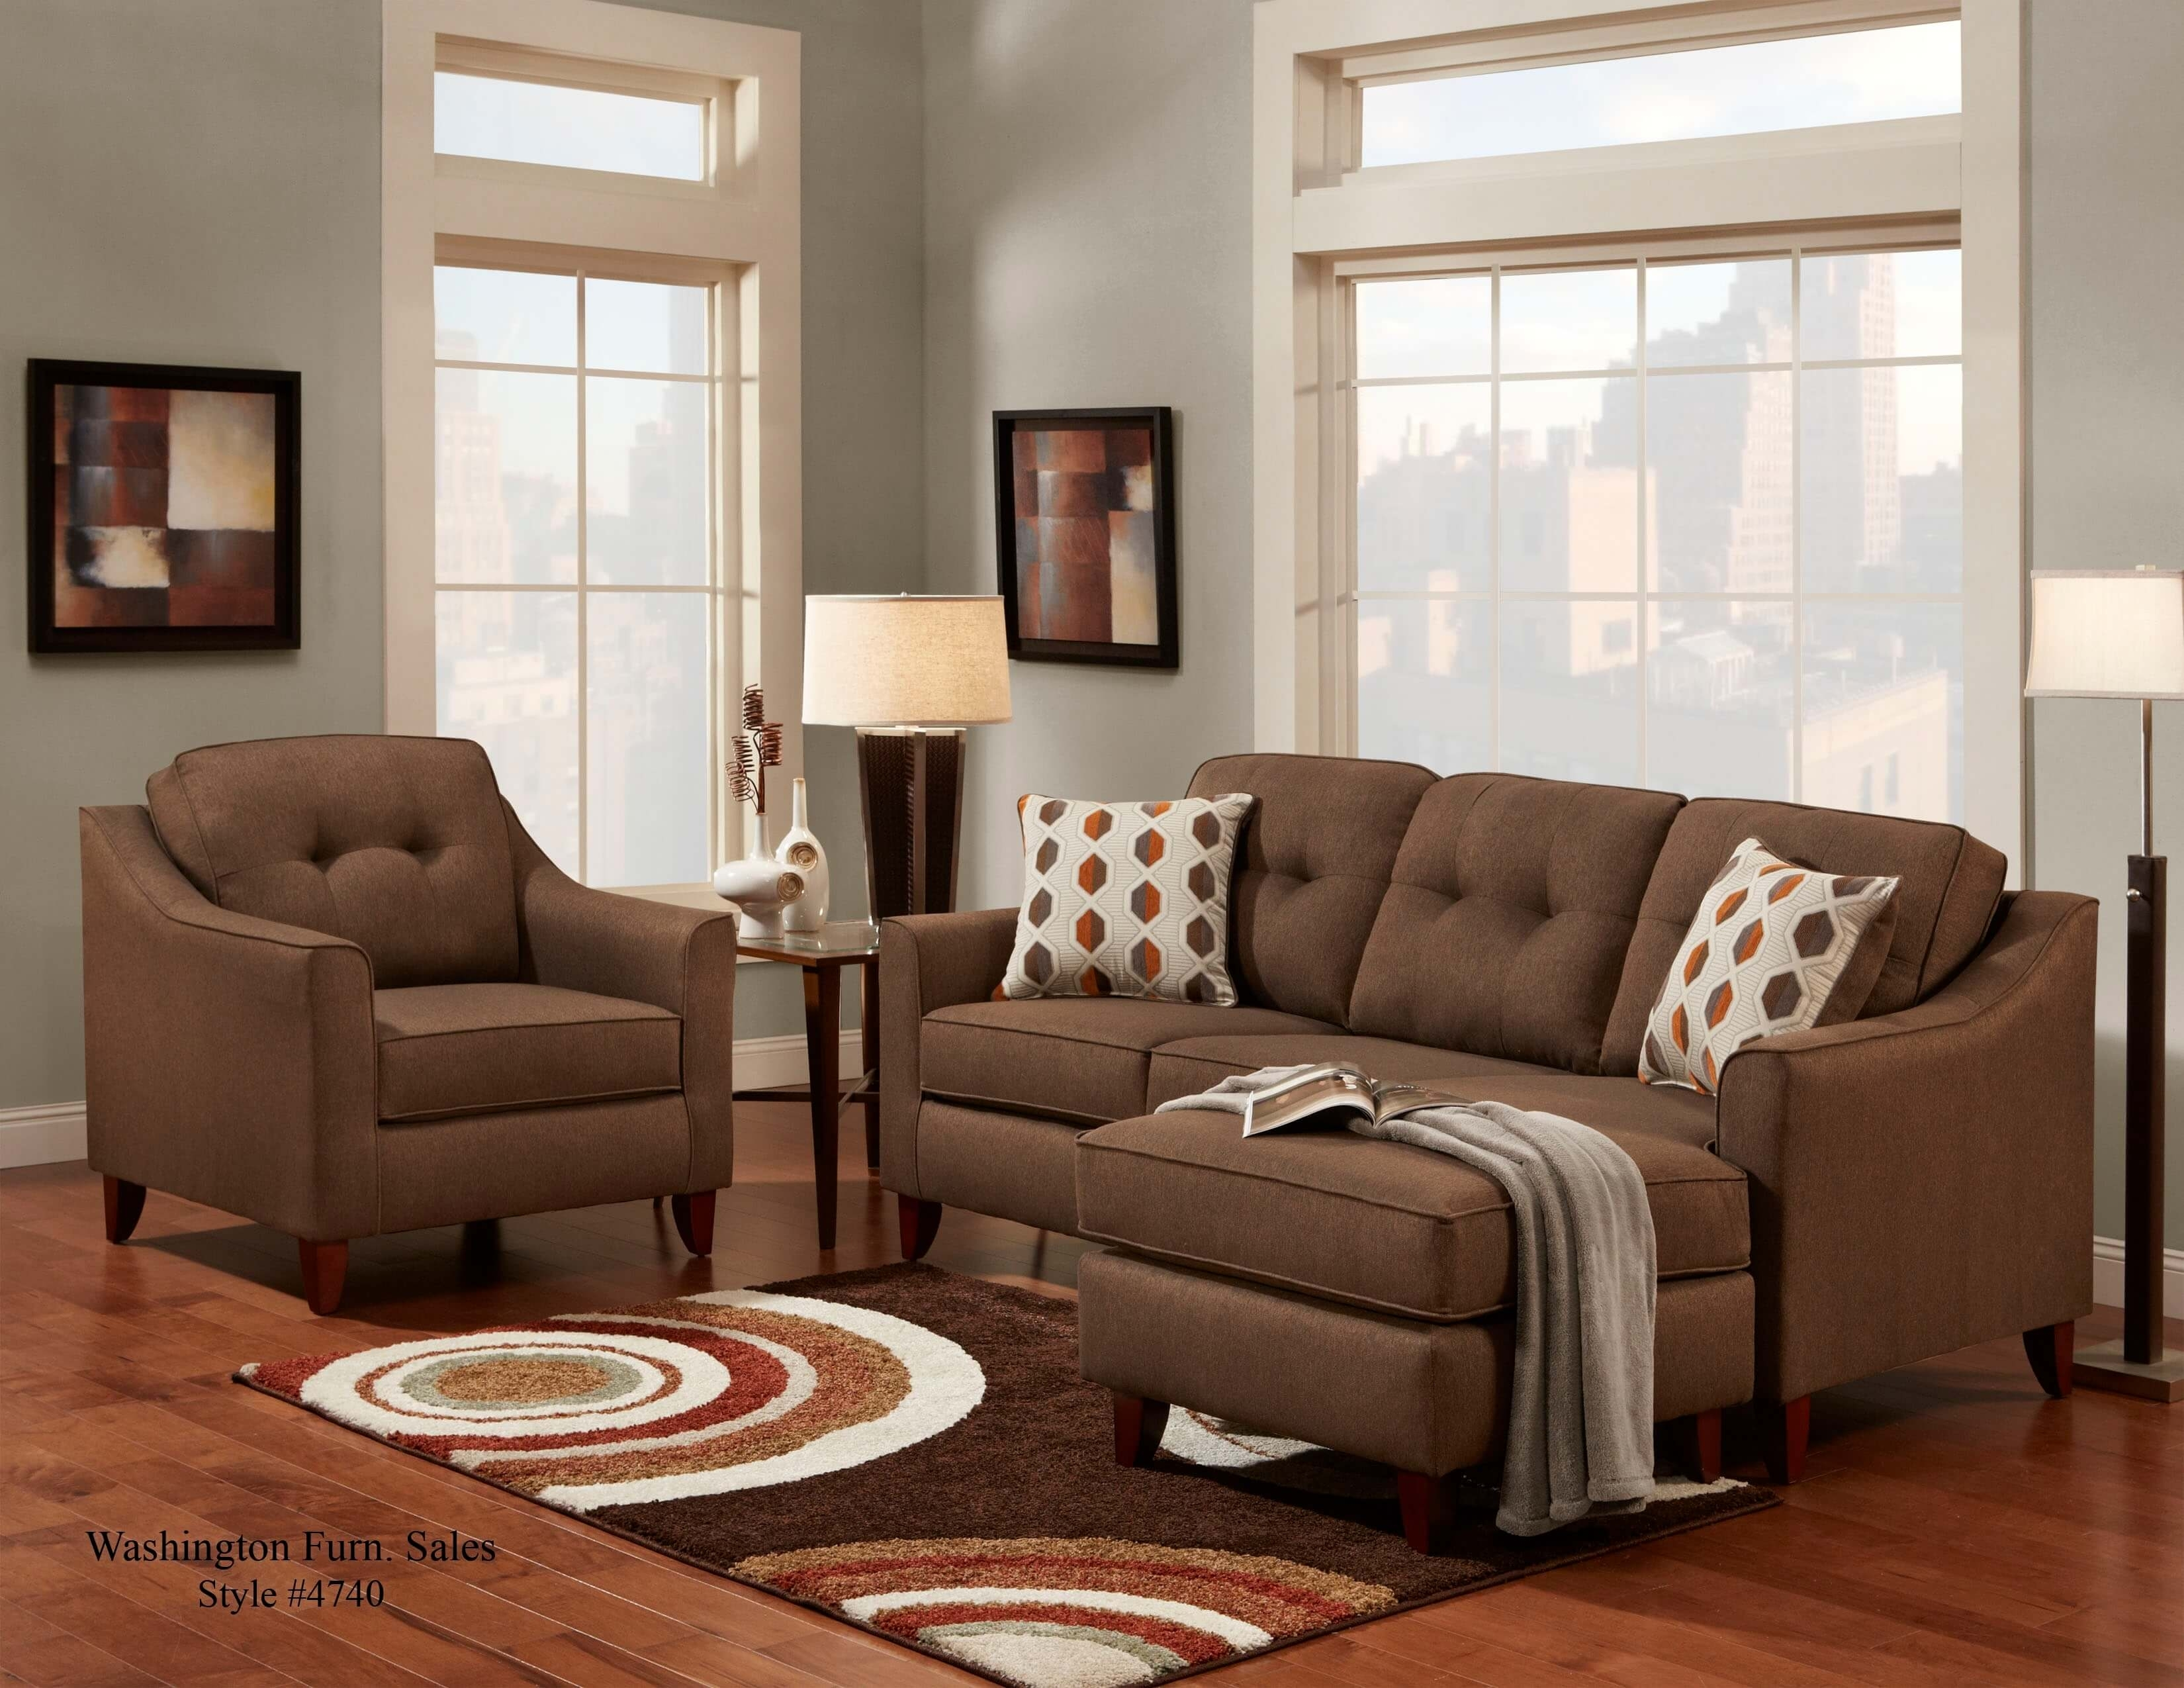 Stoked Chocolate Sofa/chaise | Sectional Sofa Sets With Chocolate Sectional Sofas (View 4 of 10)